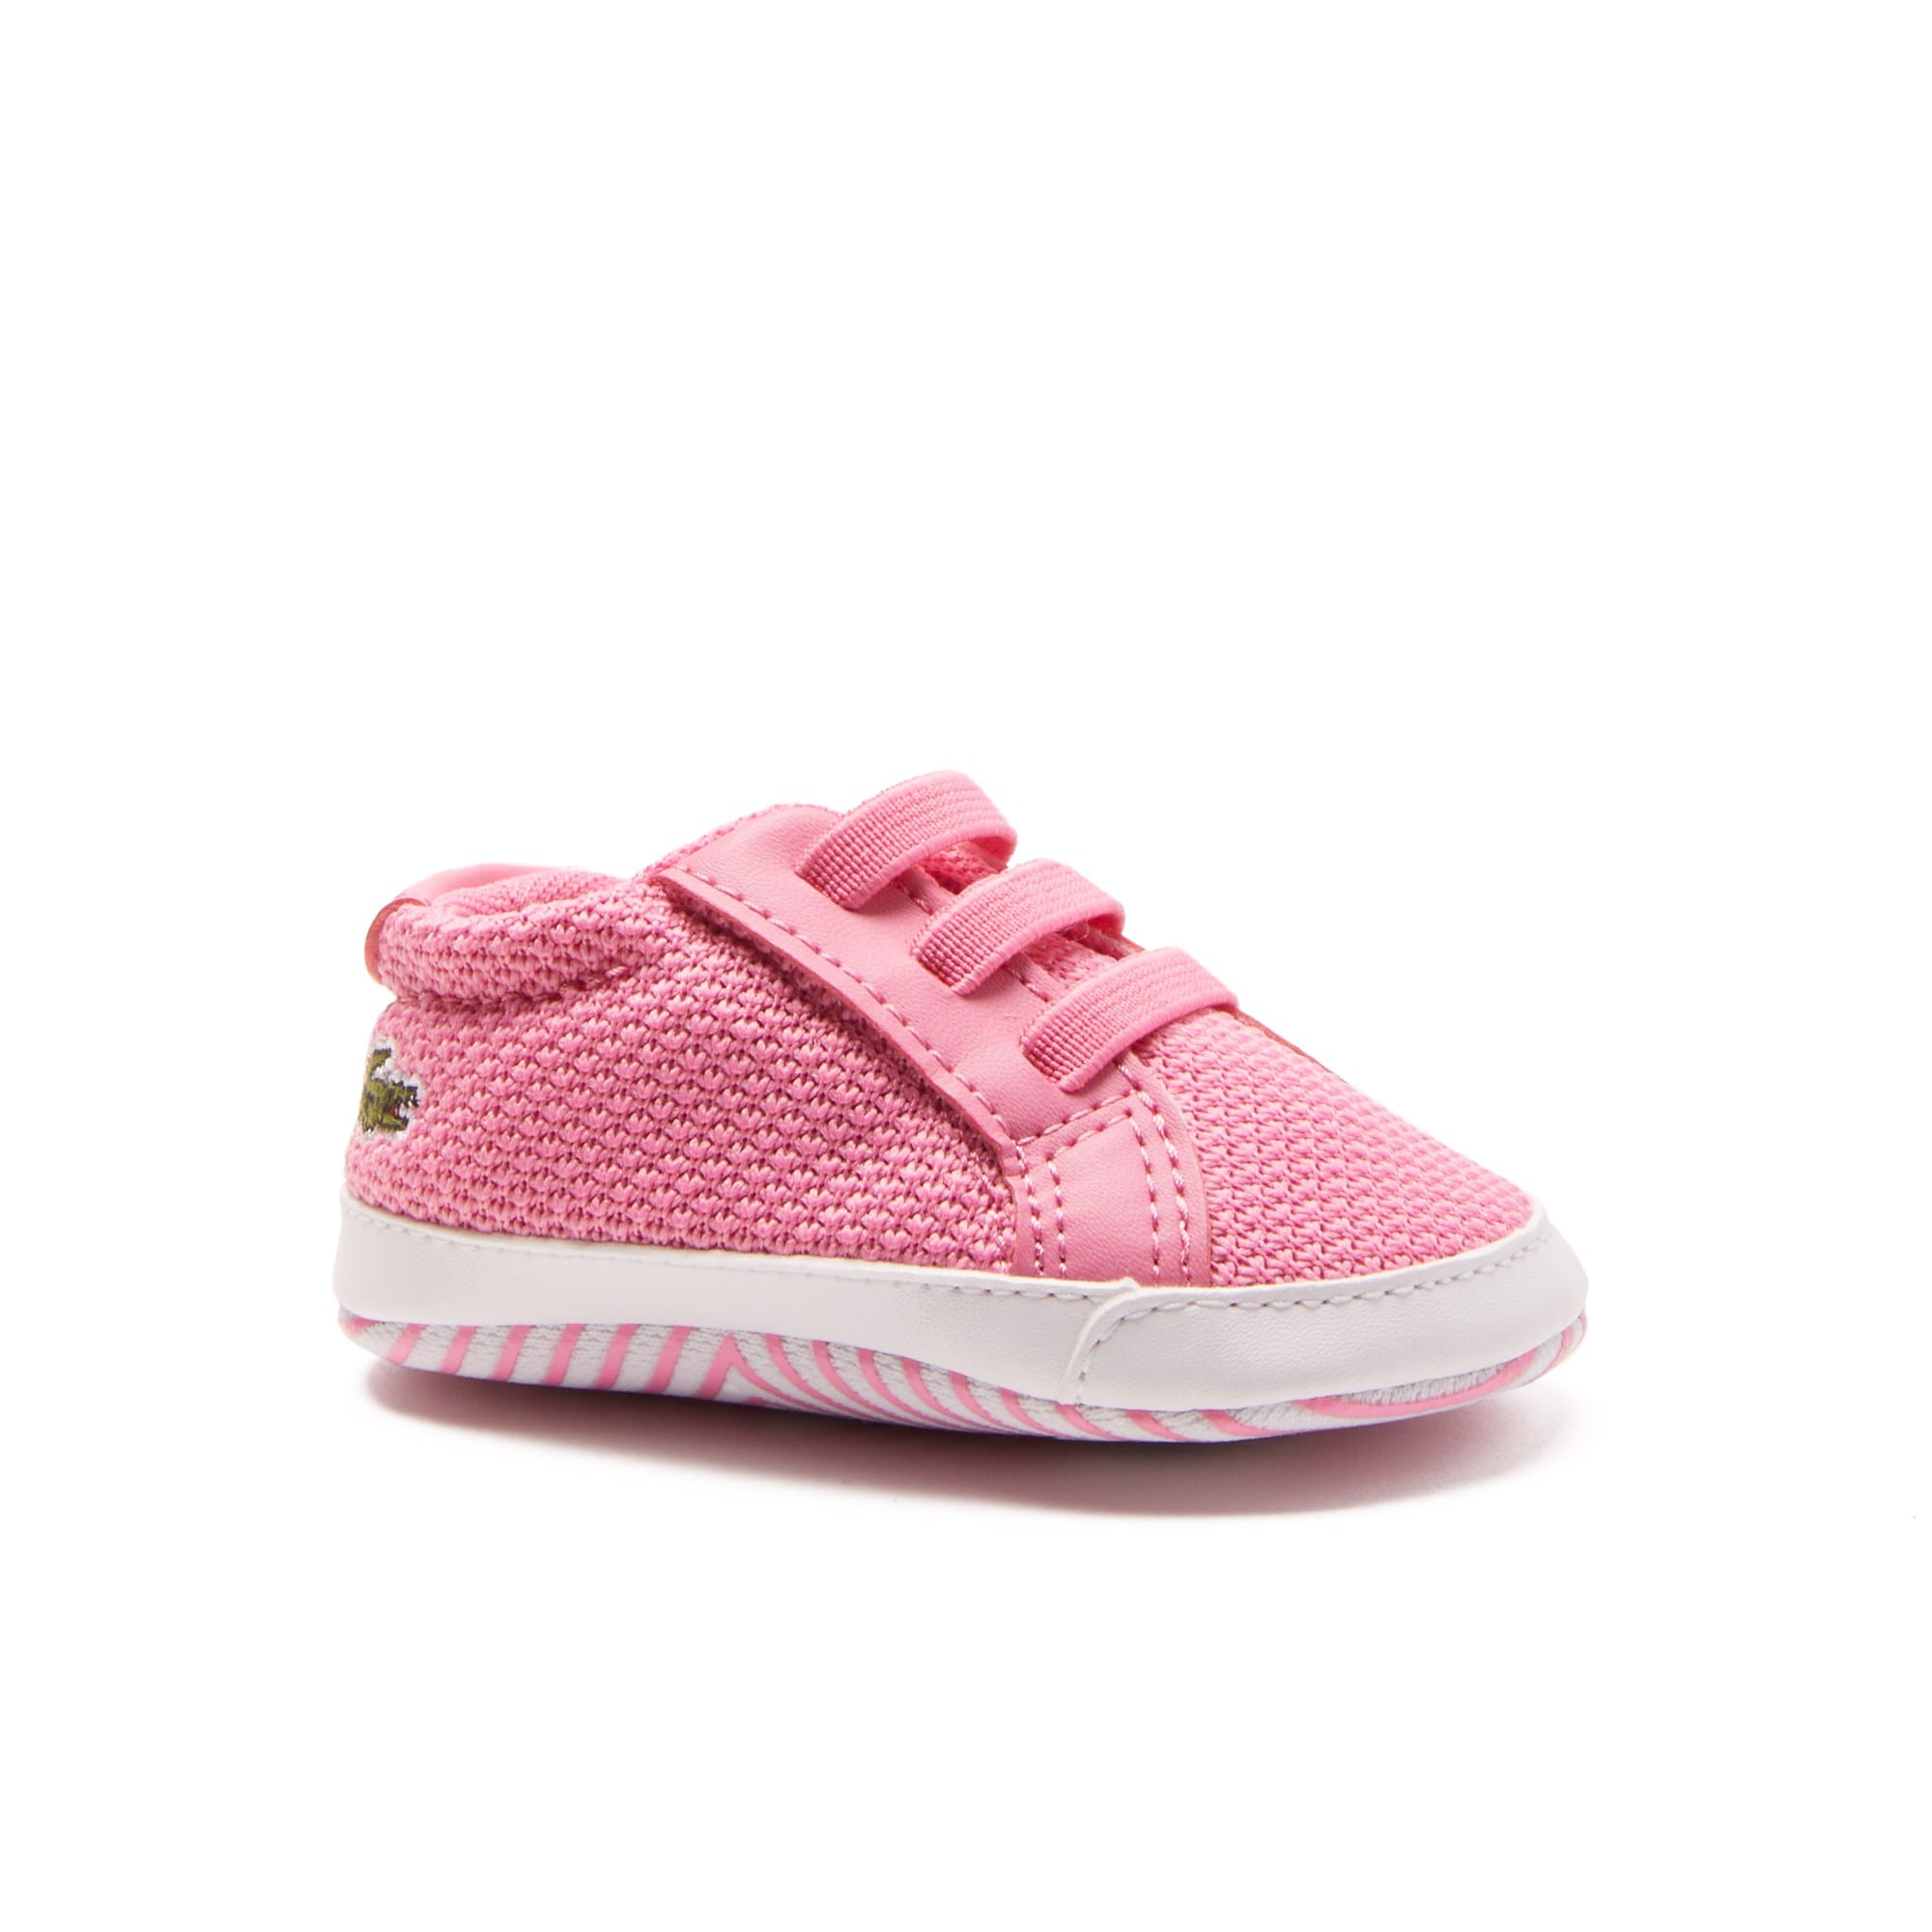 Babies' L.12.12 Crib Textile Trainers